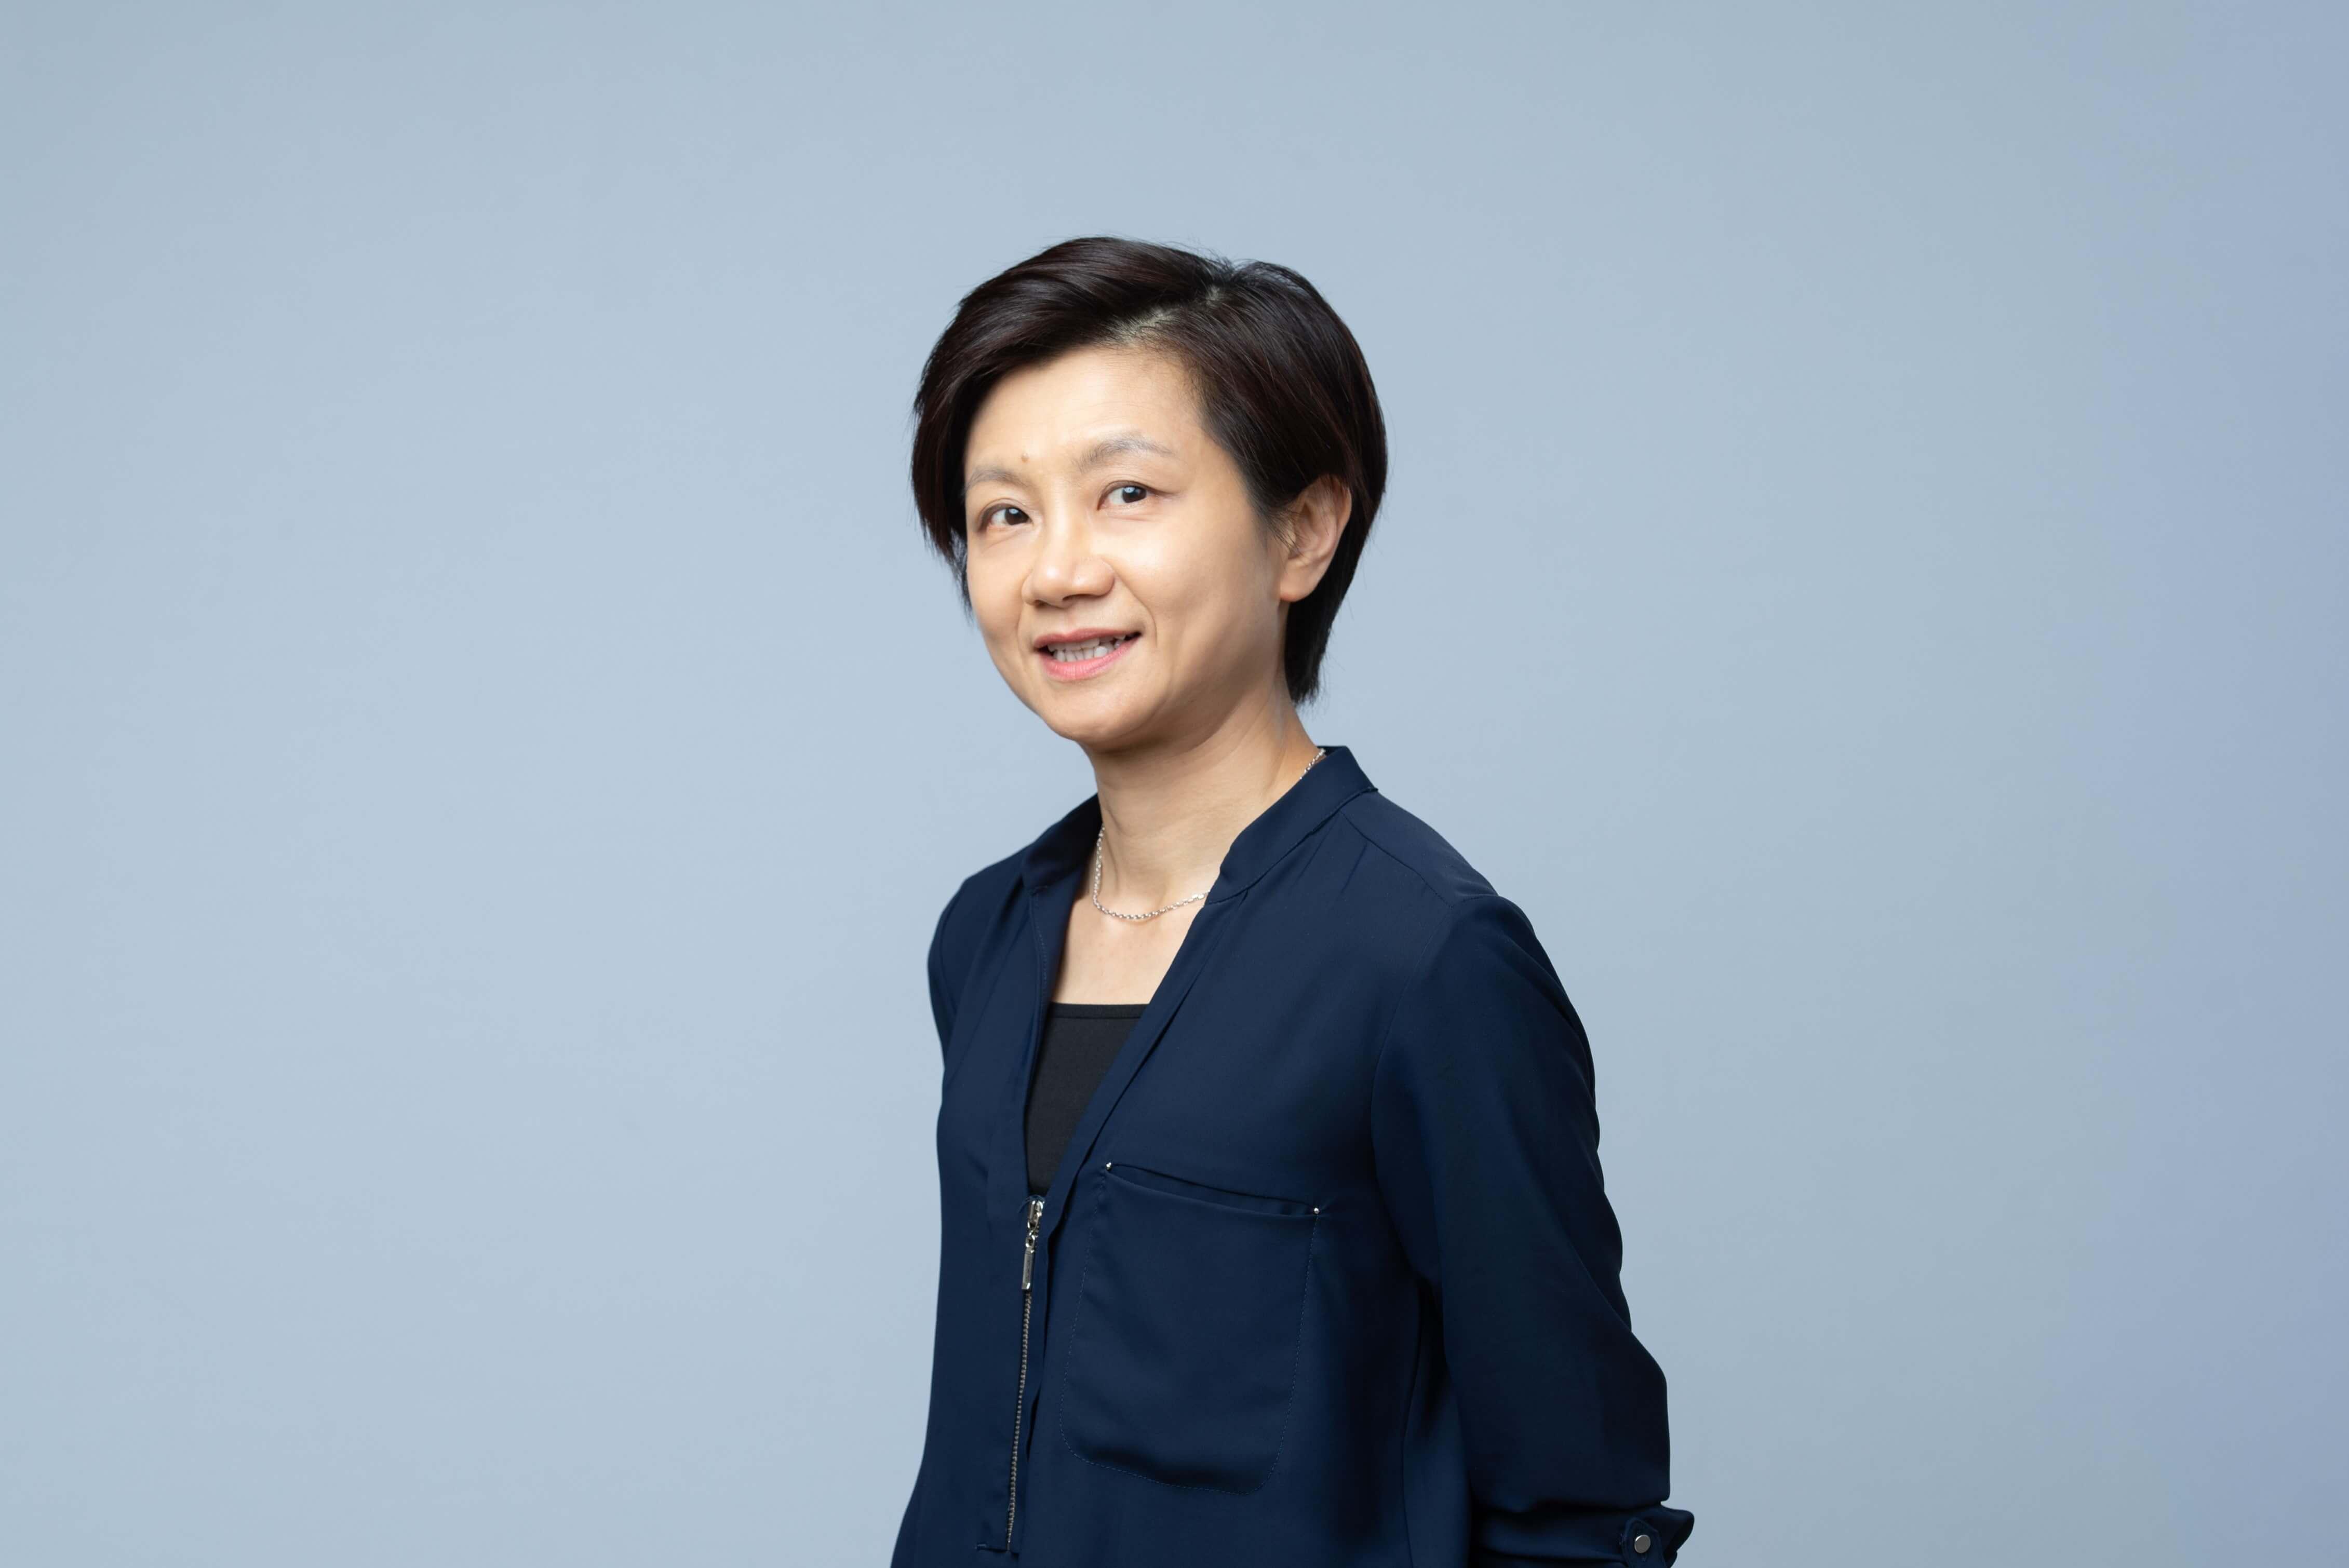 Dr. LAM Tse Fun, Cathy profile image